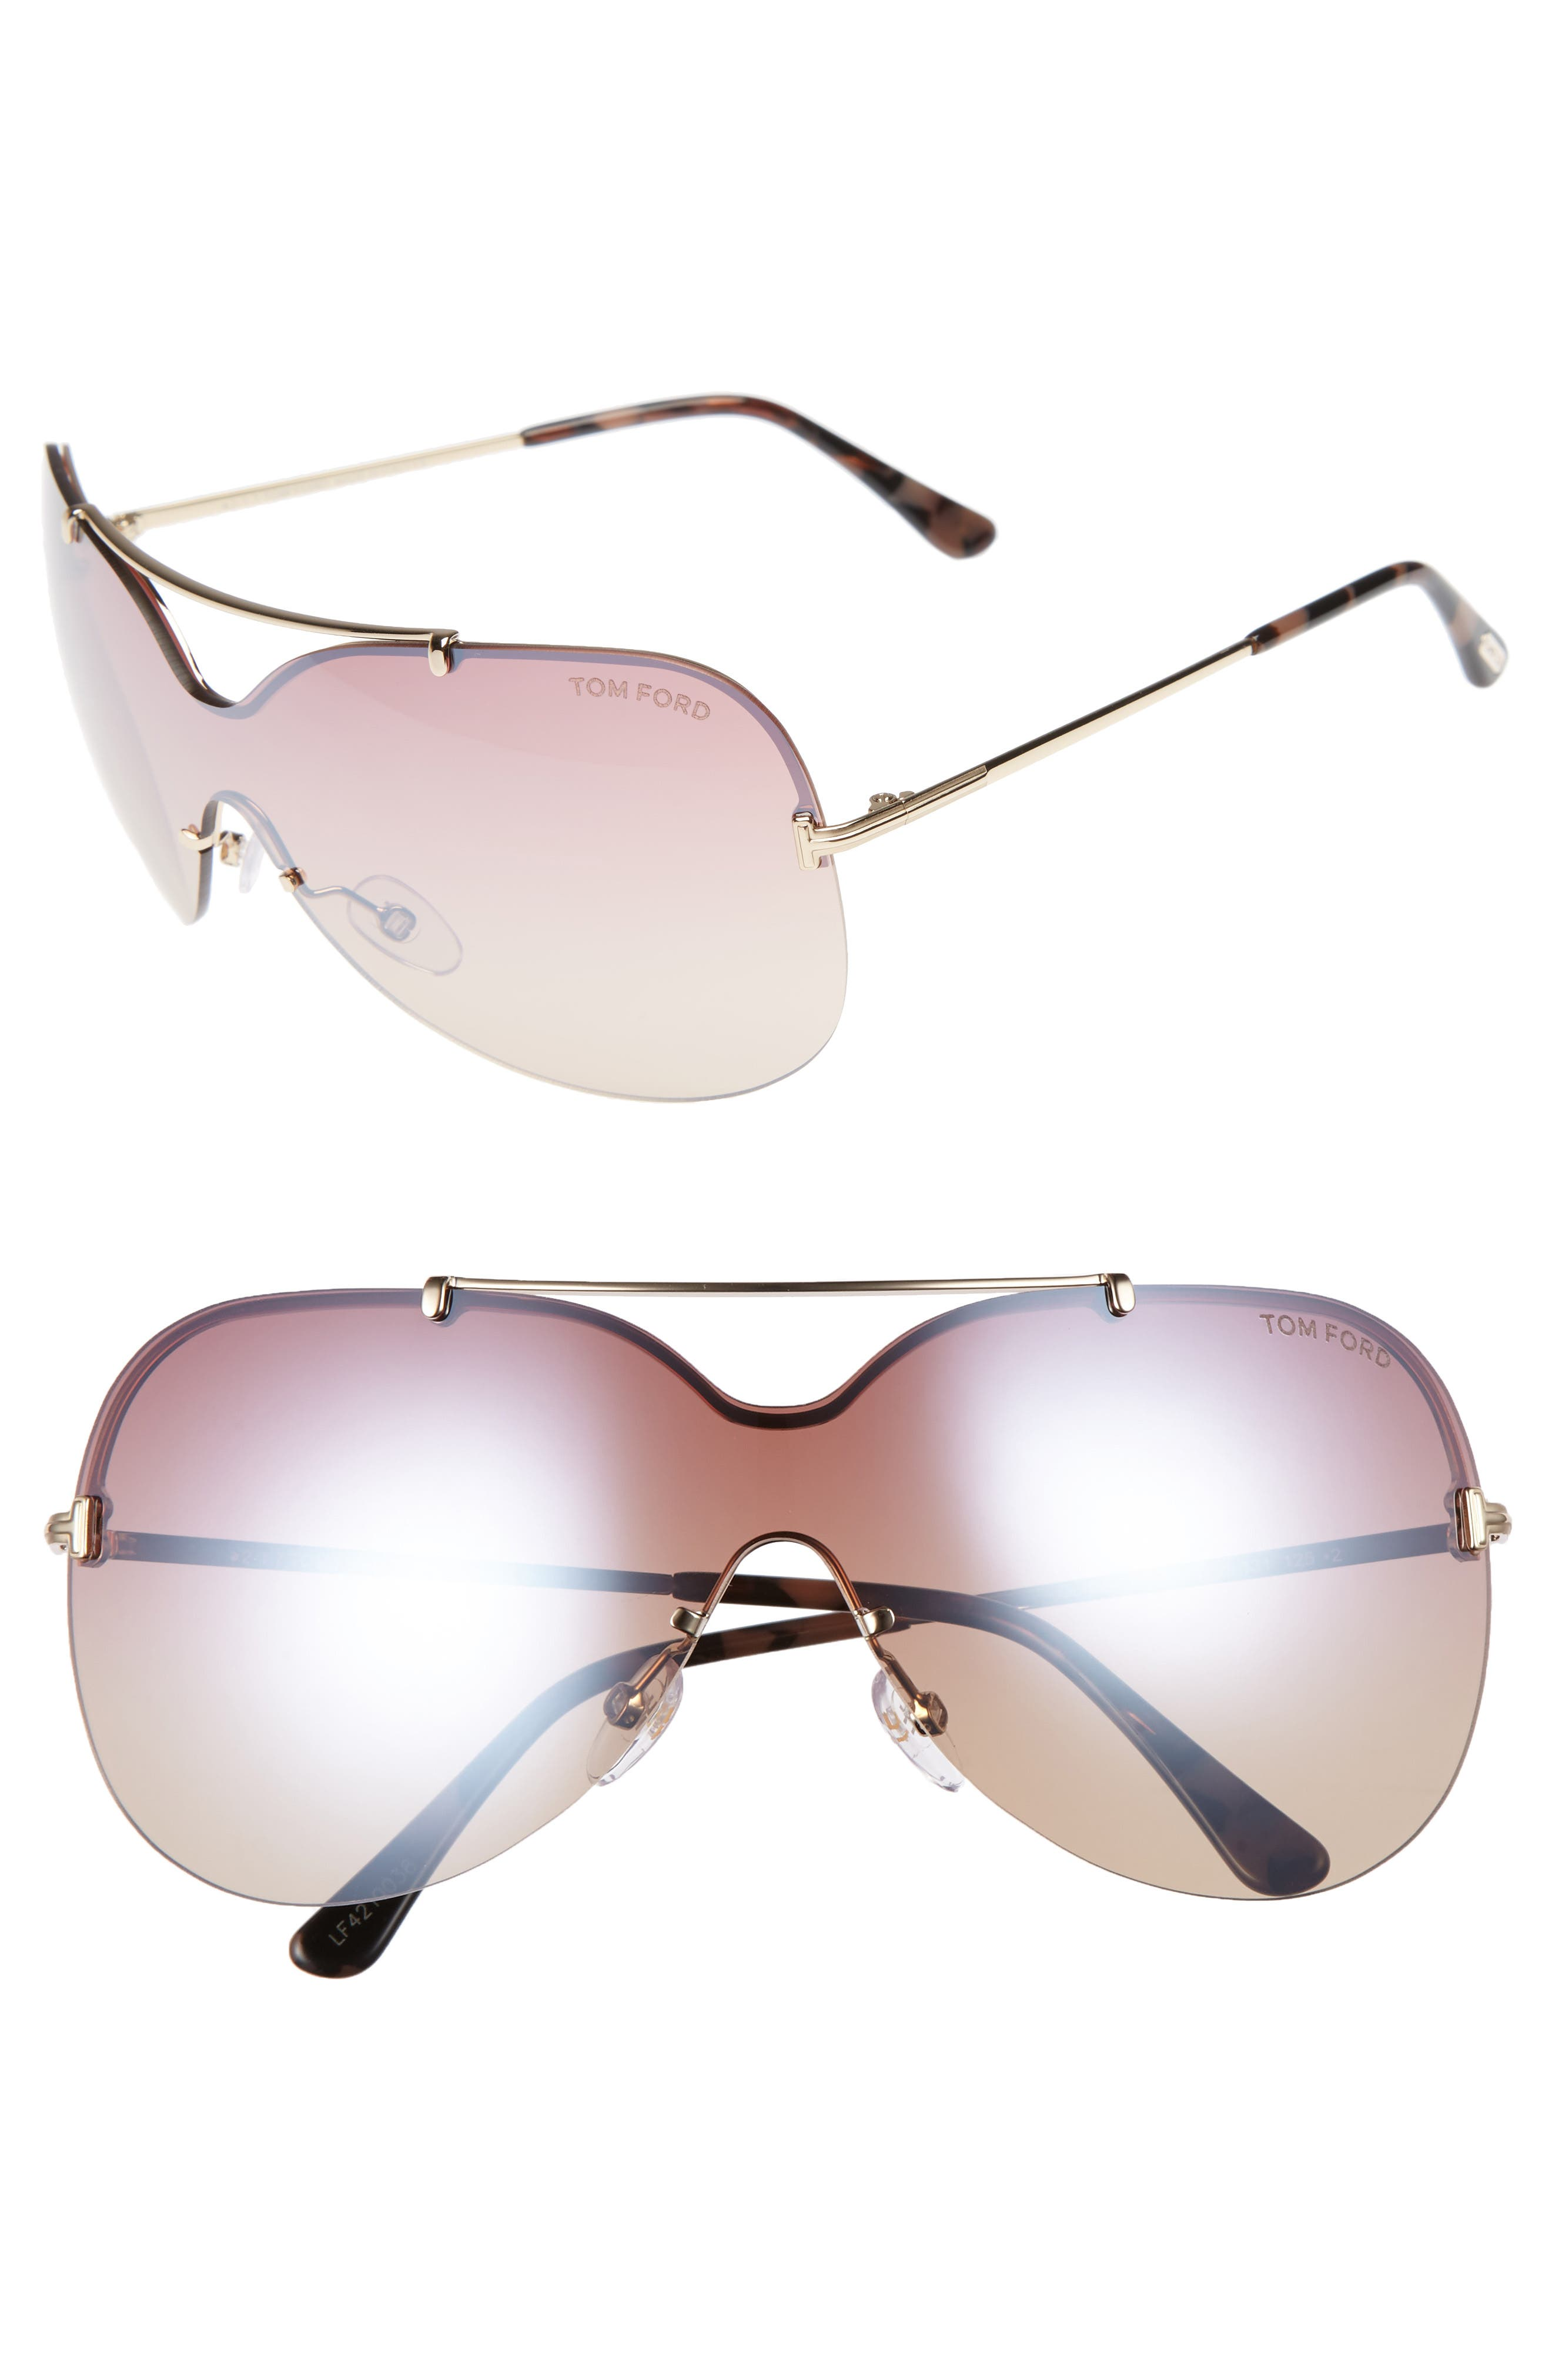 Main Image - Tom Ford Ondria Gradient Lens Shield Sunglasses